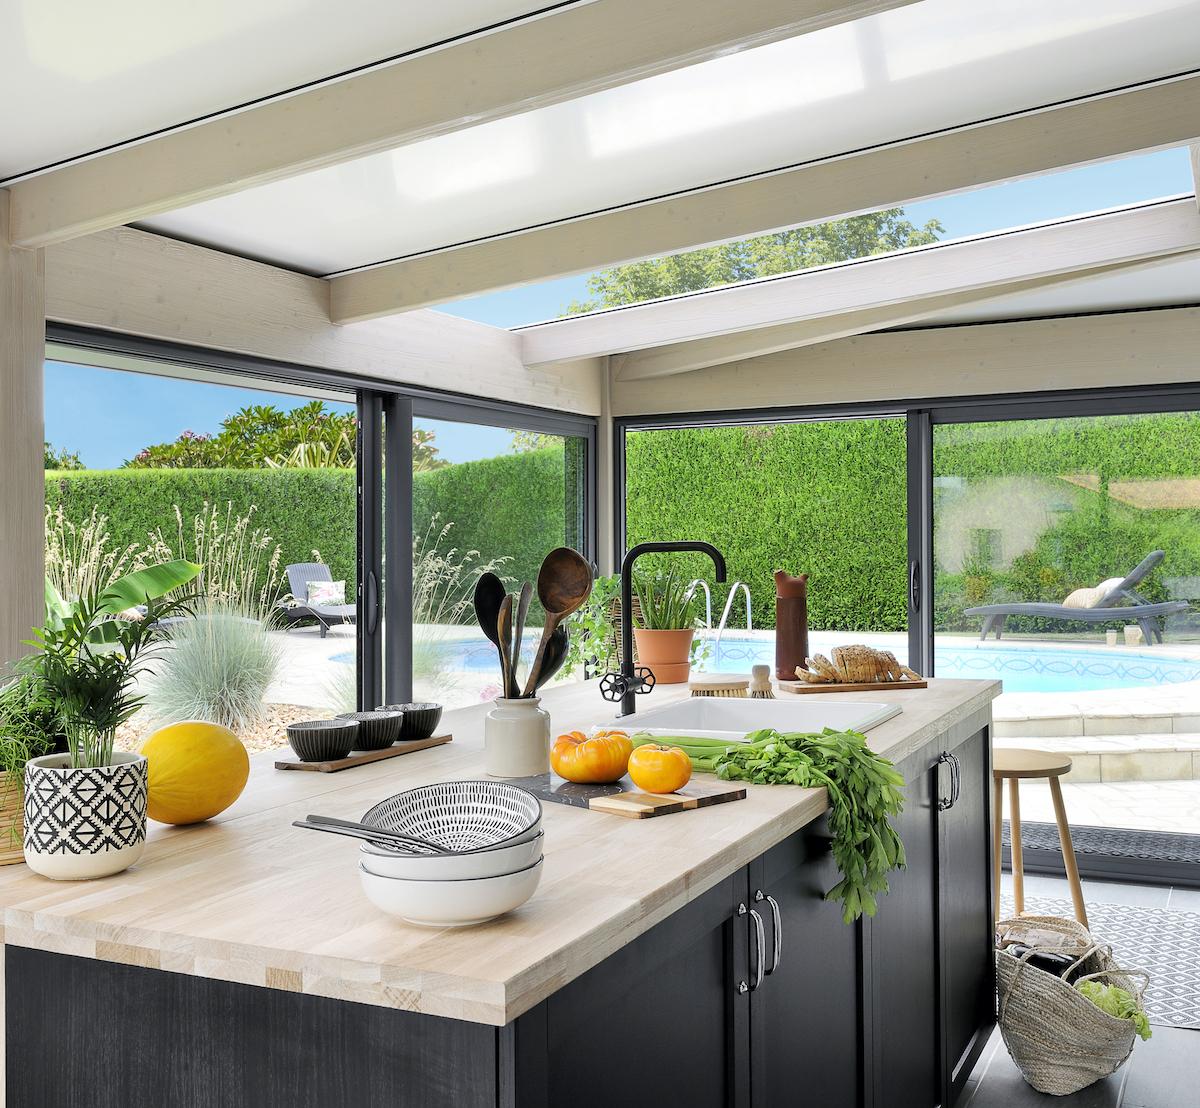 cuisine veranda aluminium bois intérieur ilot centrale panier osier